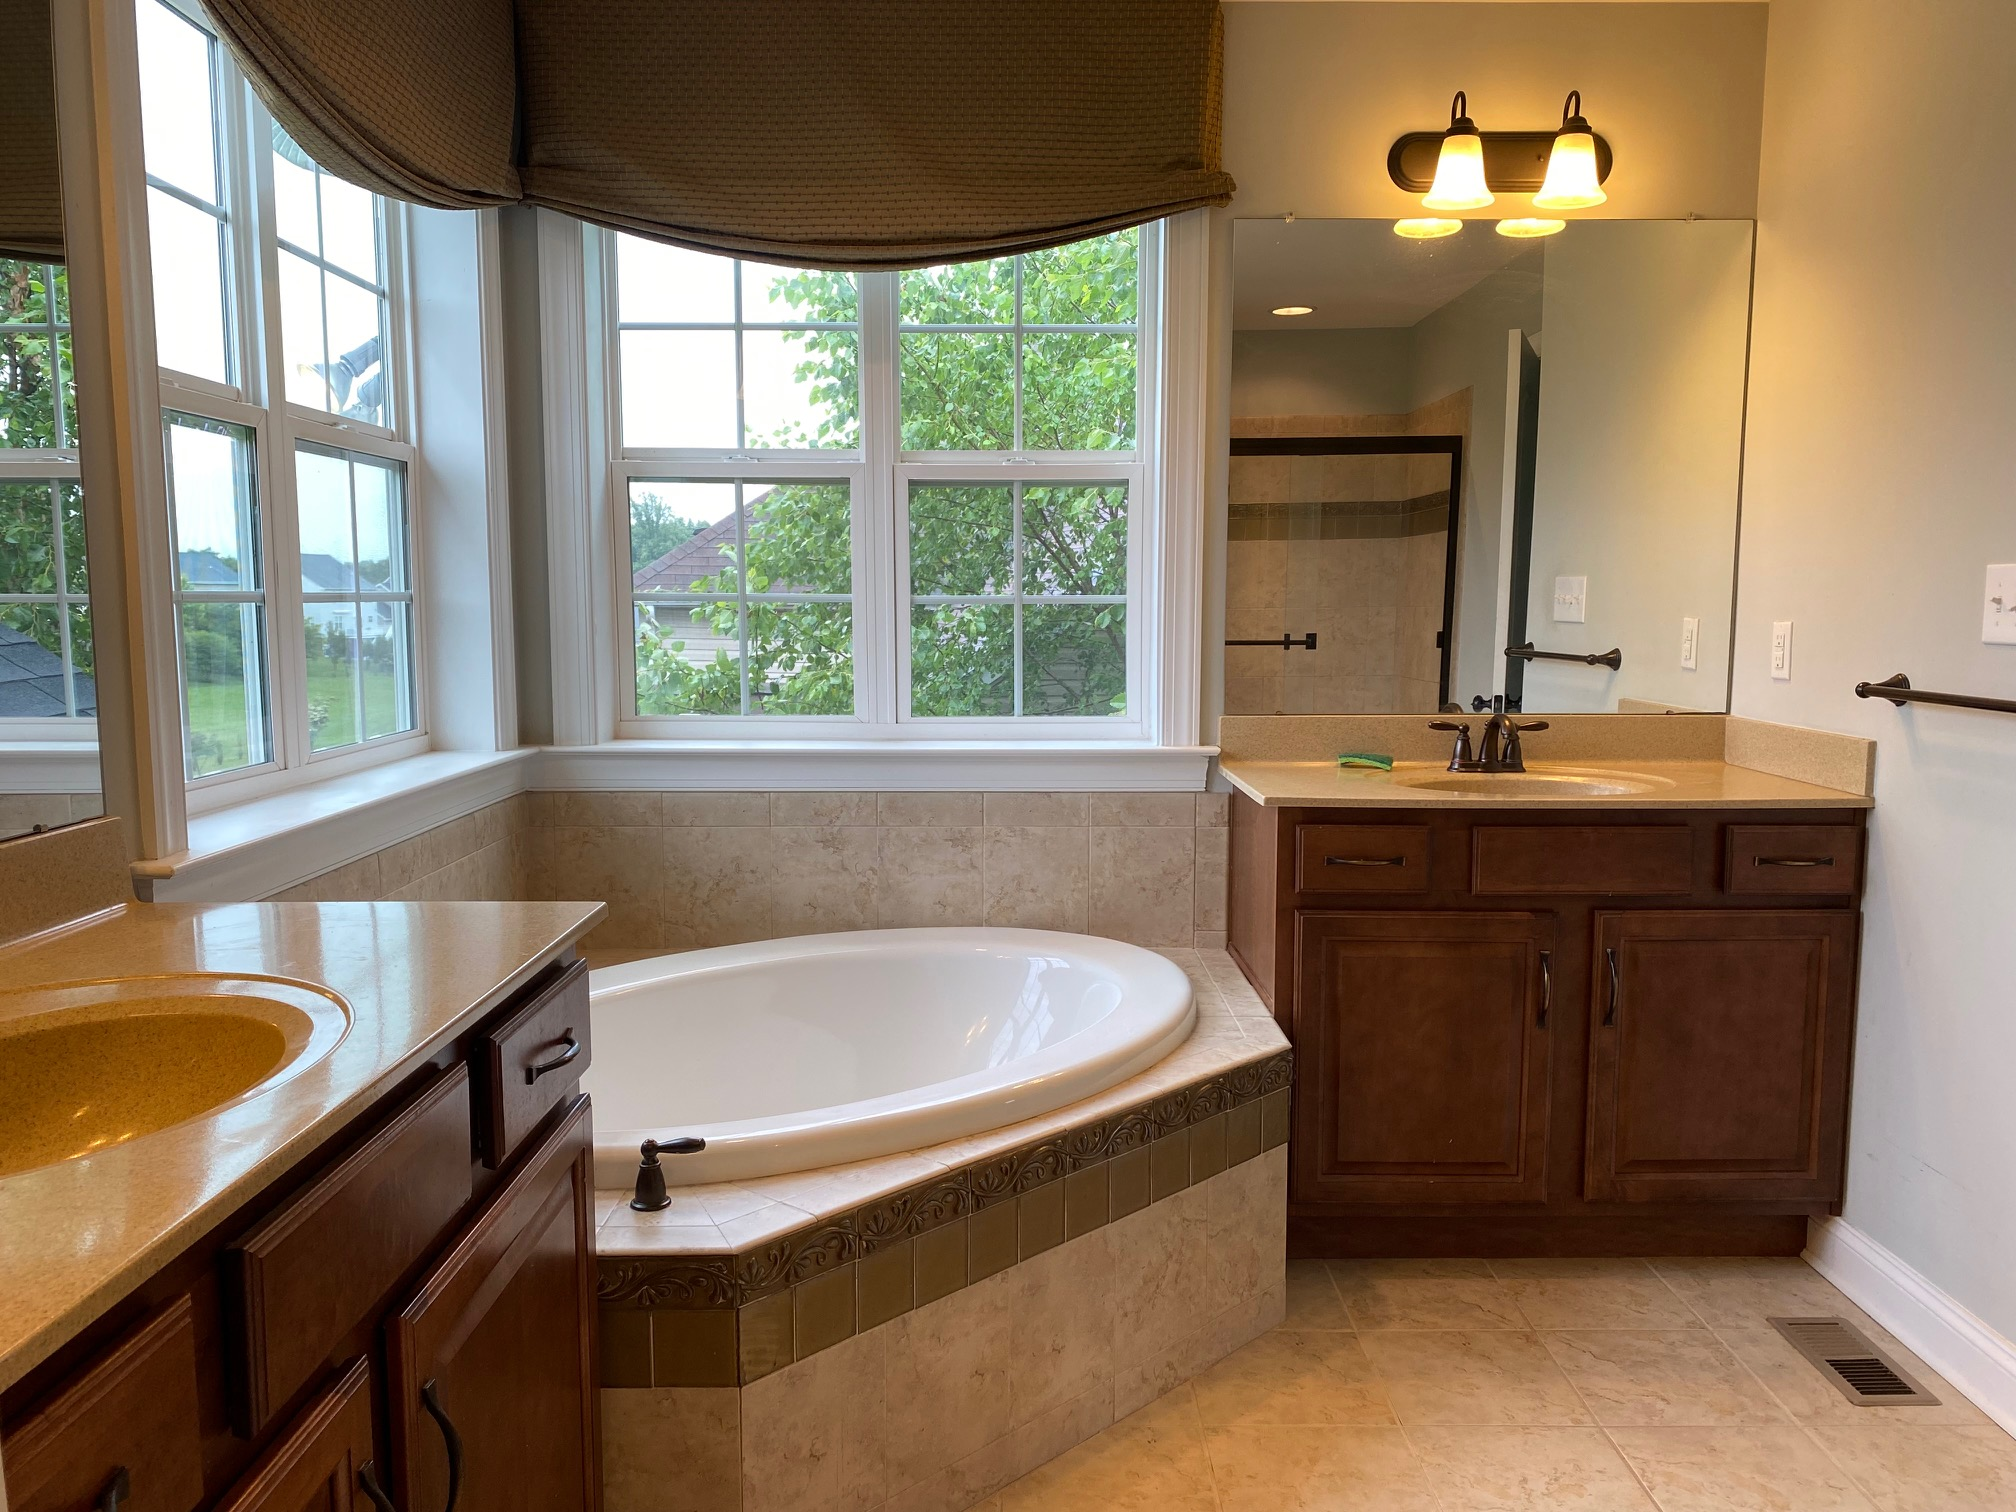 301, Hockessin, Delaware 19707, 4 Rooms Rooms,3 BathroomsBathrooms,House,For Rent,1160